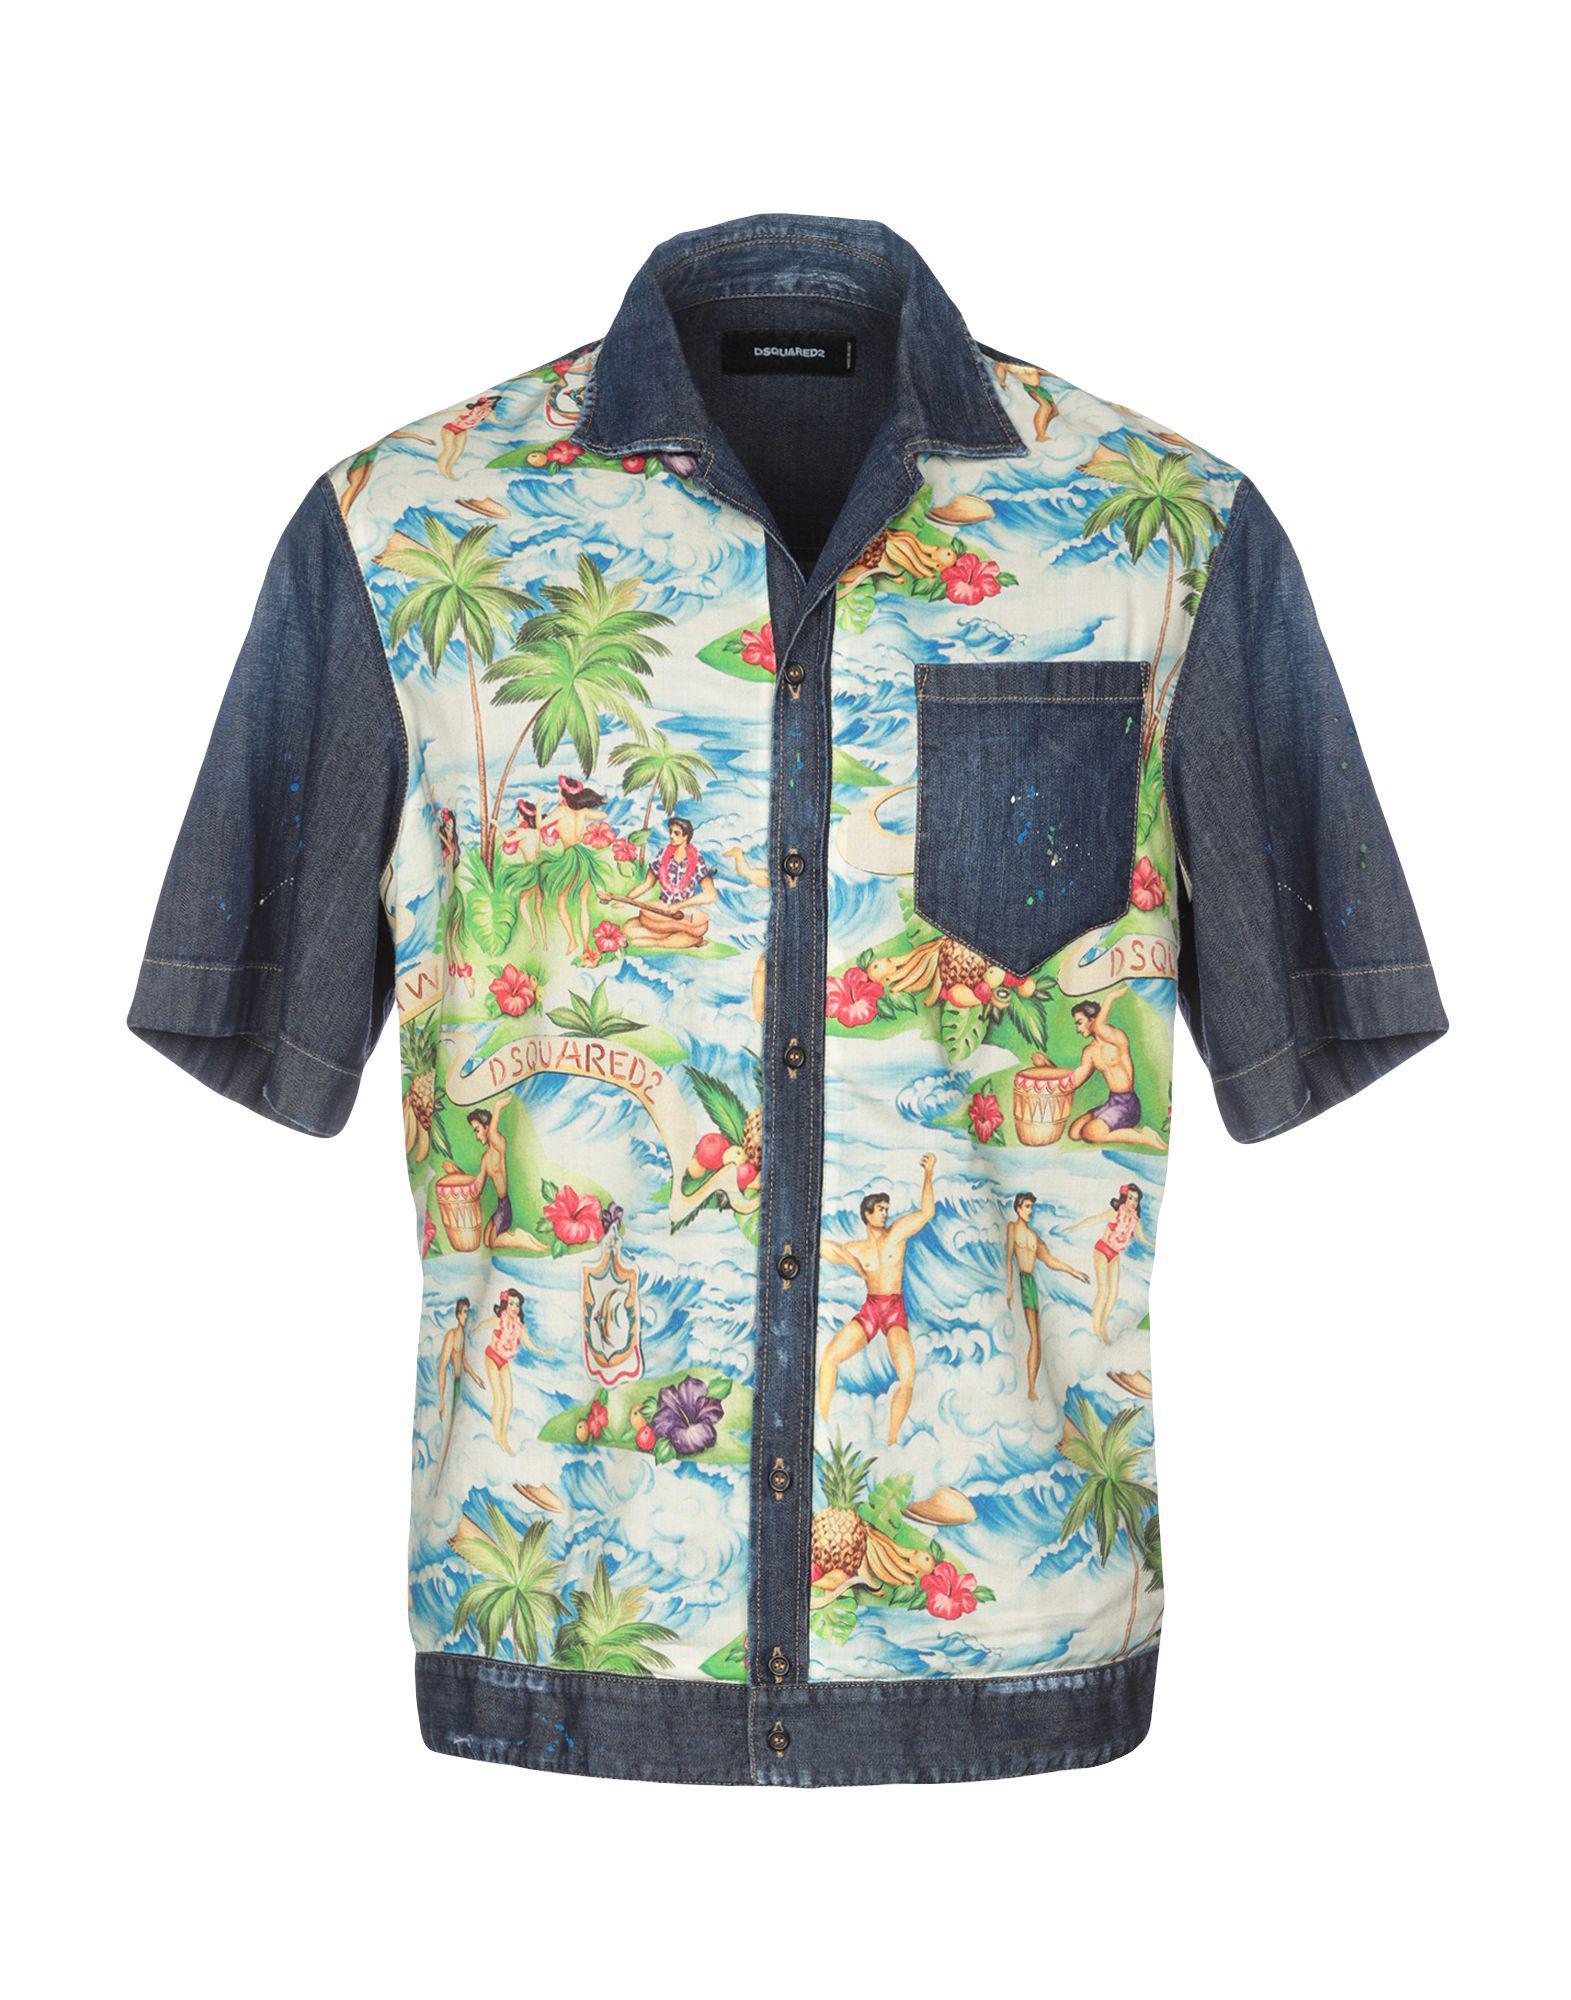 d4539336ea Lyst - DSquared² Denim Shirt in Blue for Men